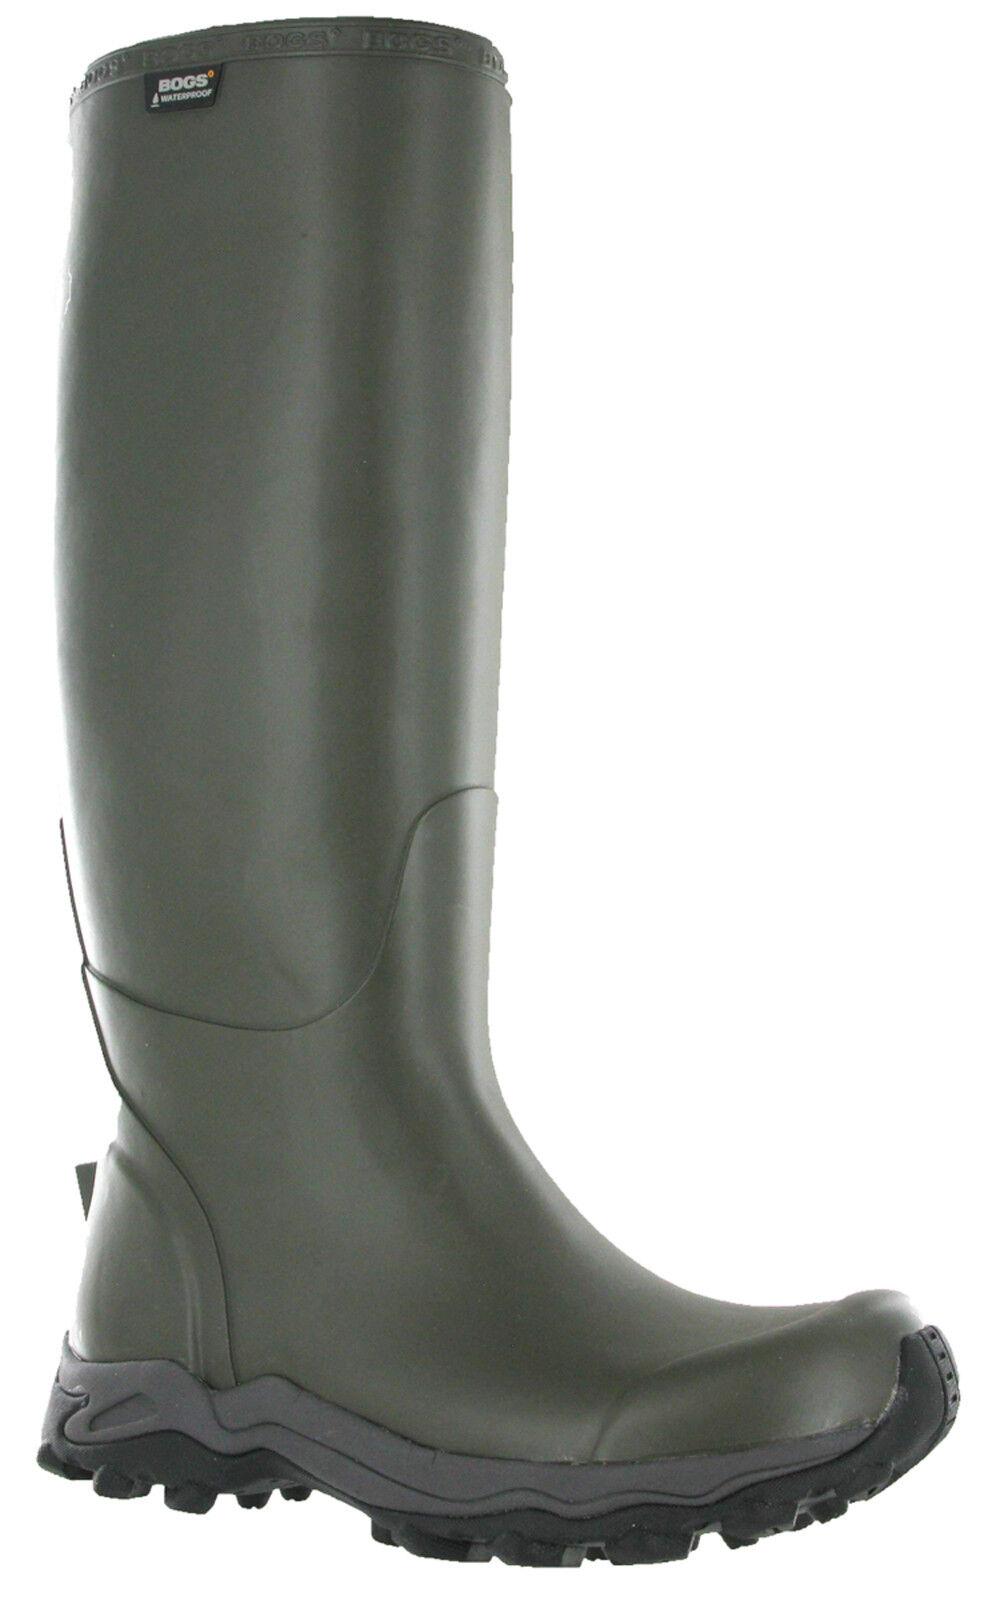 Bogs Wellingtons Farmer Tall Bradford Rubber Stiefel Cushioned Cushioned Stiefel Grip Wellies  Herren 7bcf43